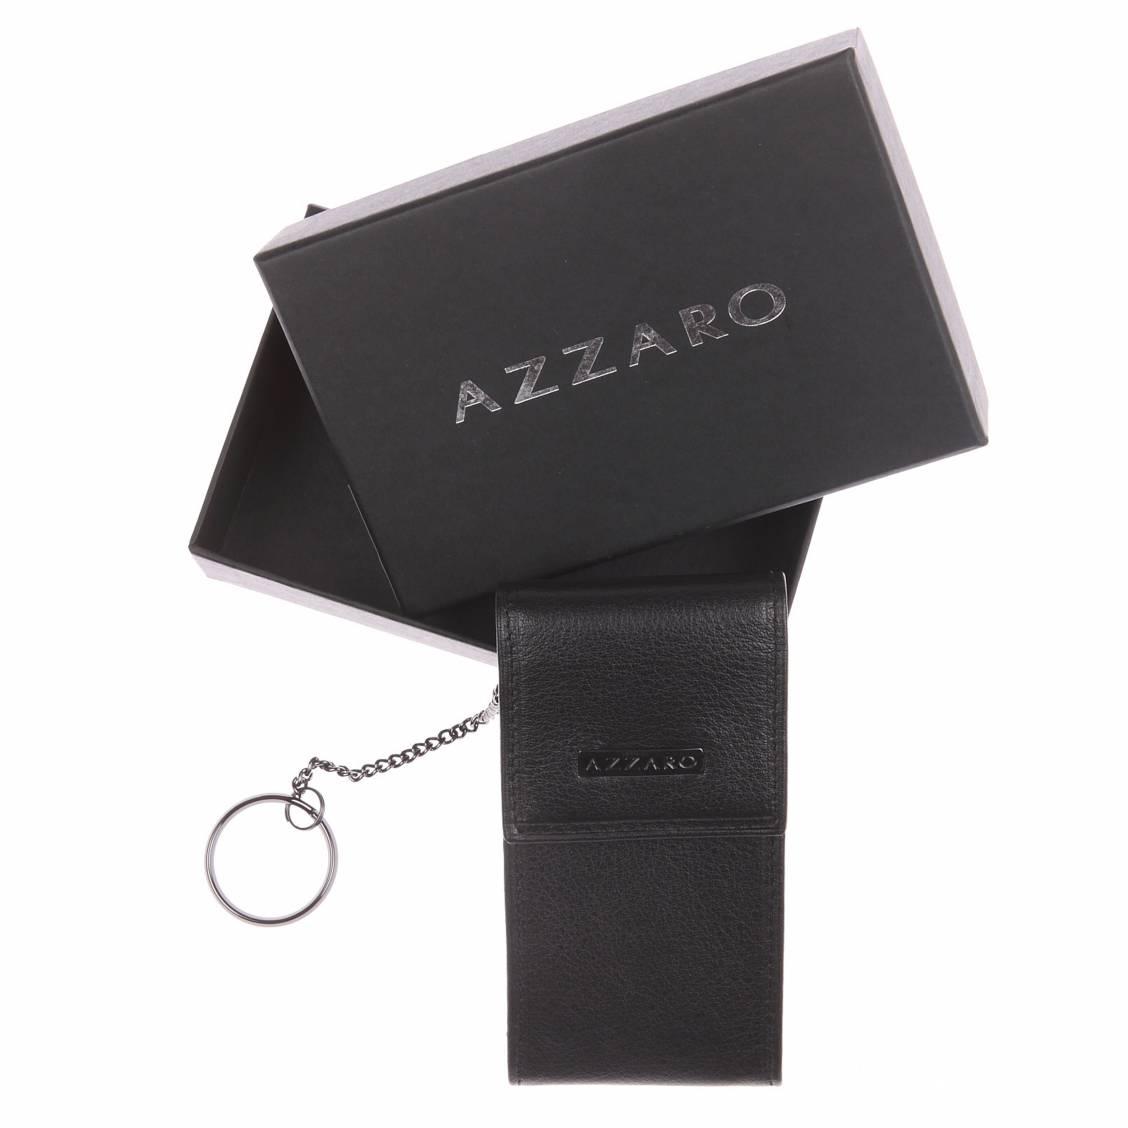 Porte-clés Azzaro estampillé en cuir noir